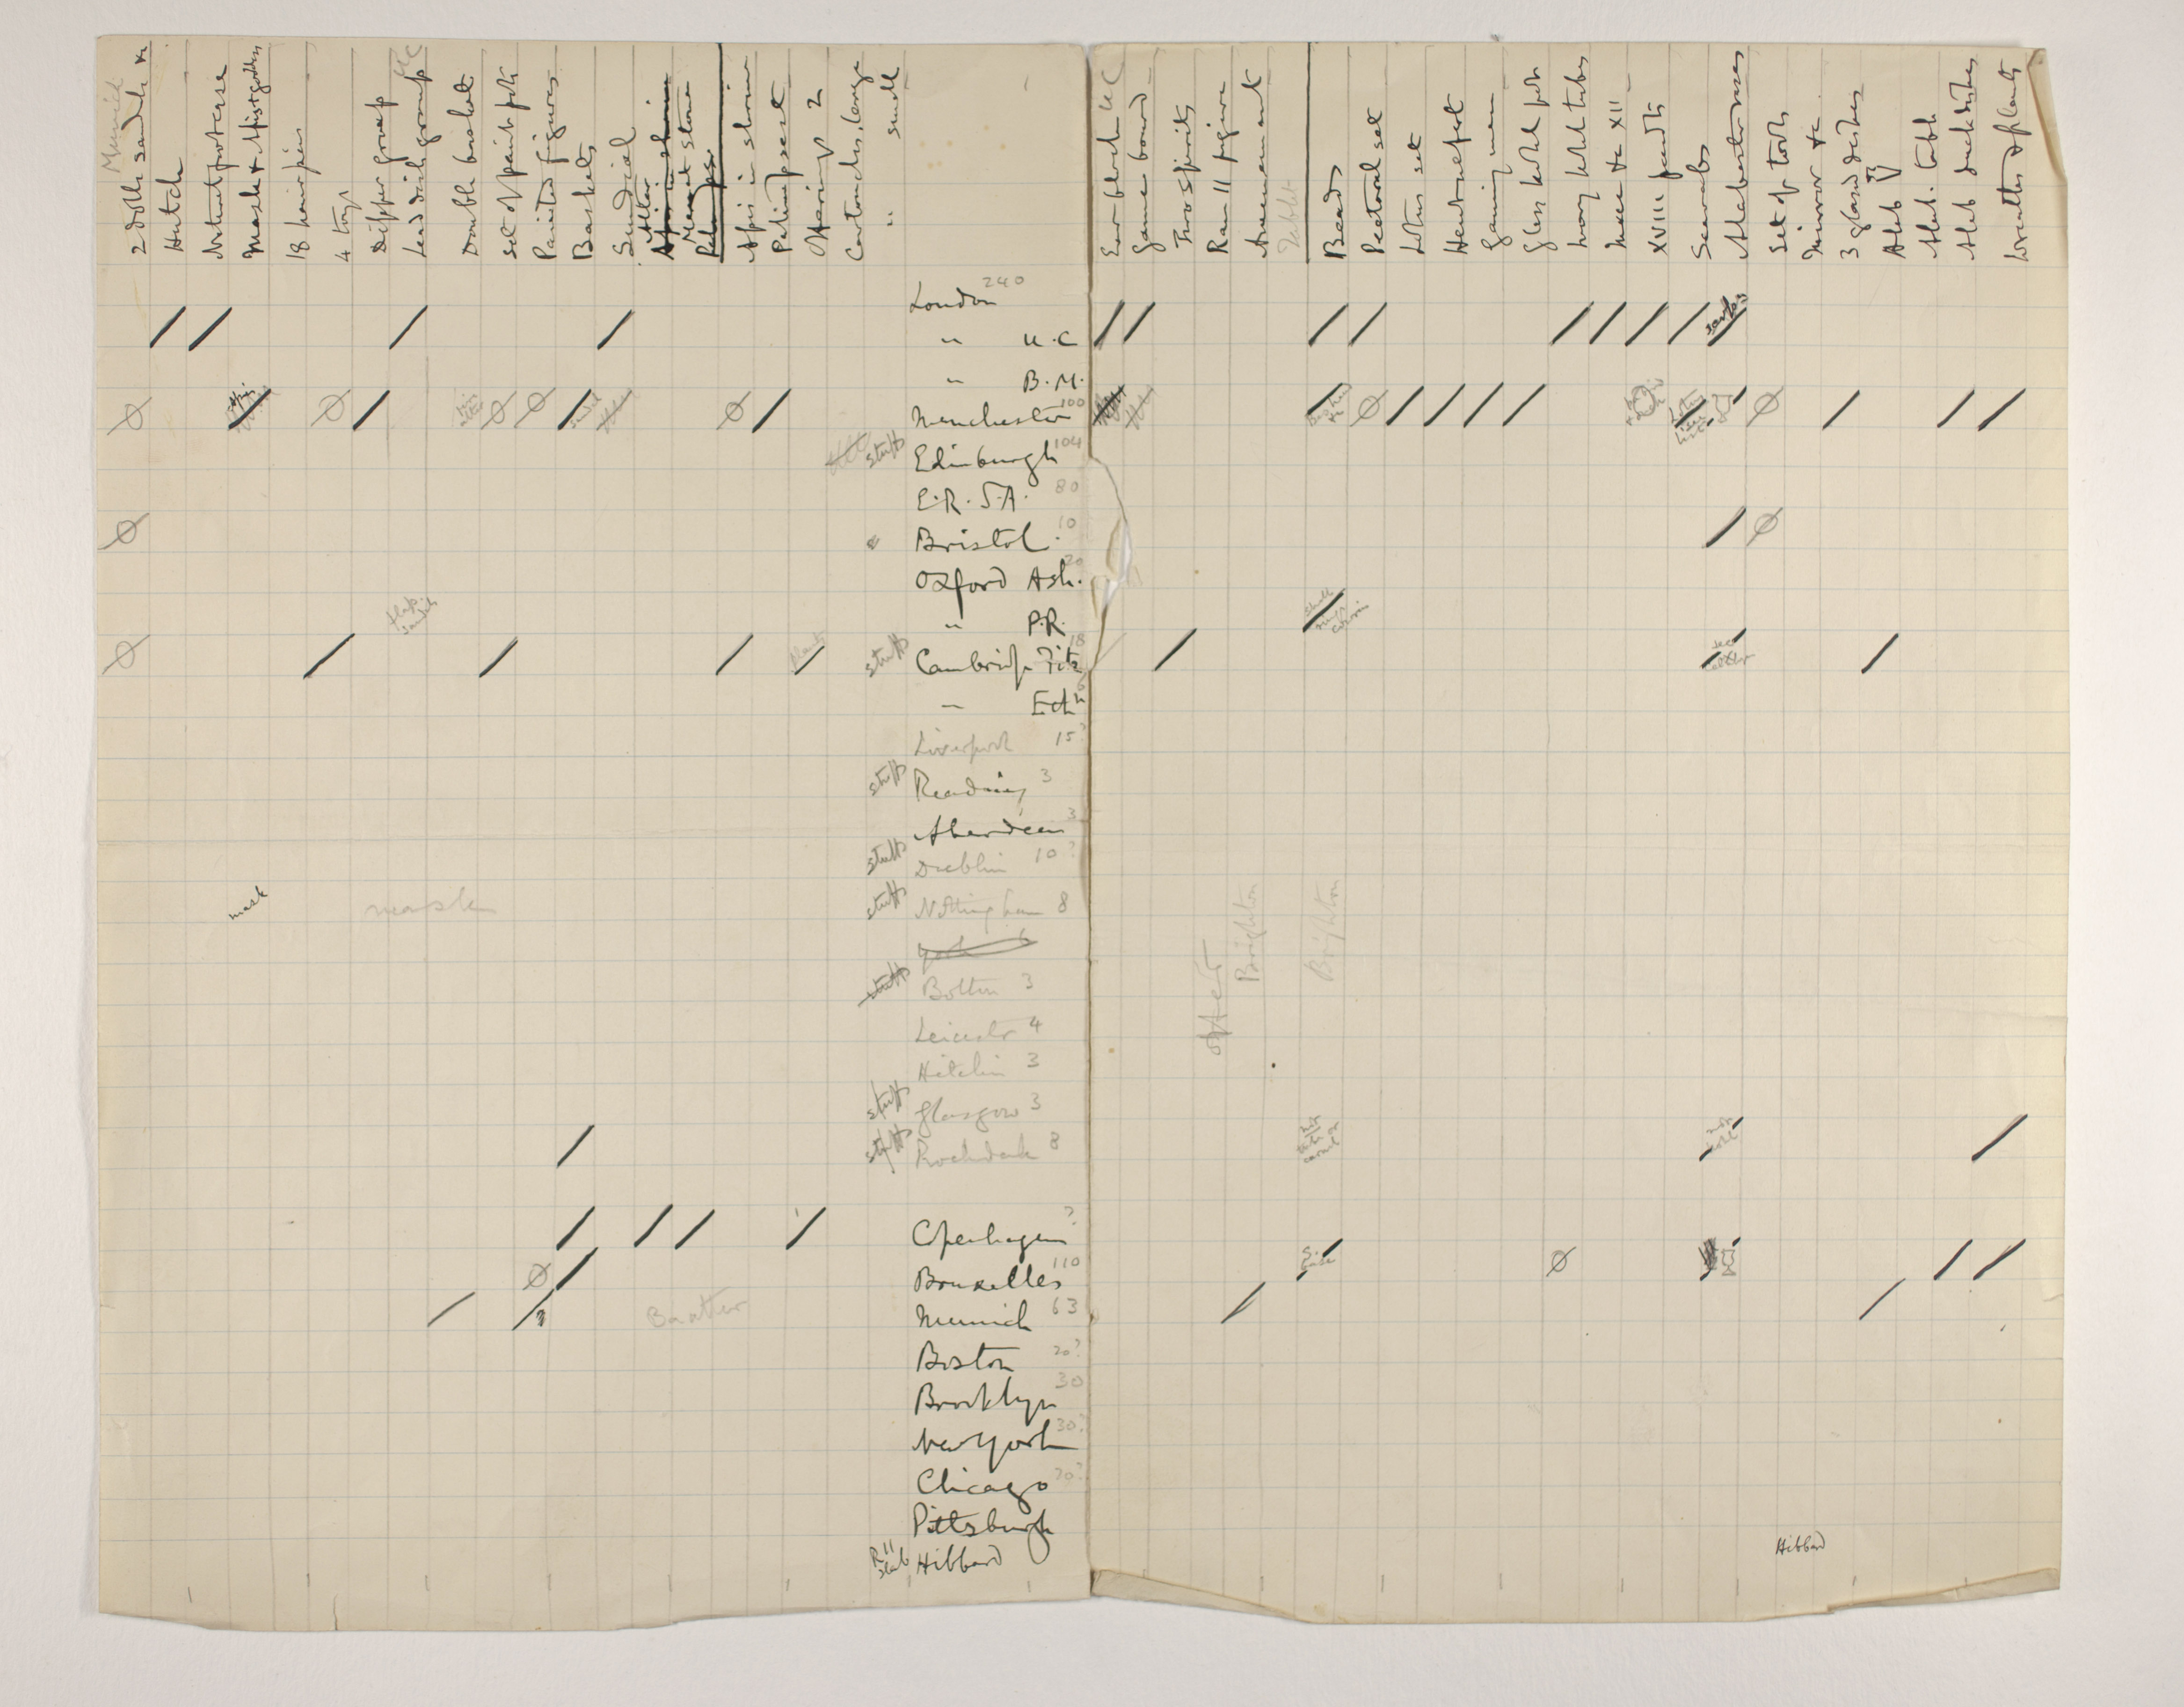 1910-11 Hawara, Gerzeh, Memphis, Mazghuneh Distribution grid PMA/WFP1/D/19/2